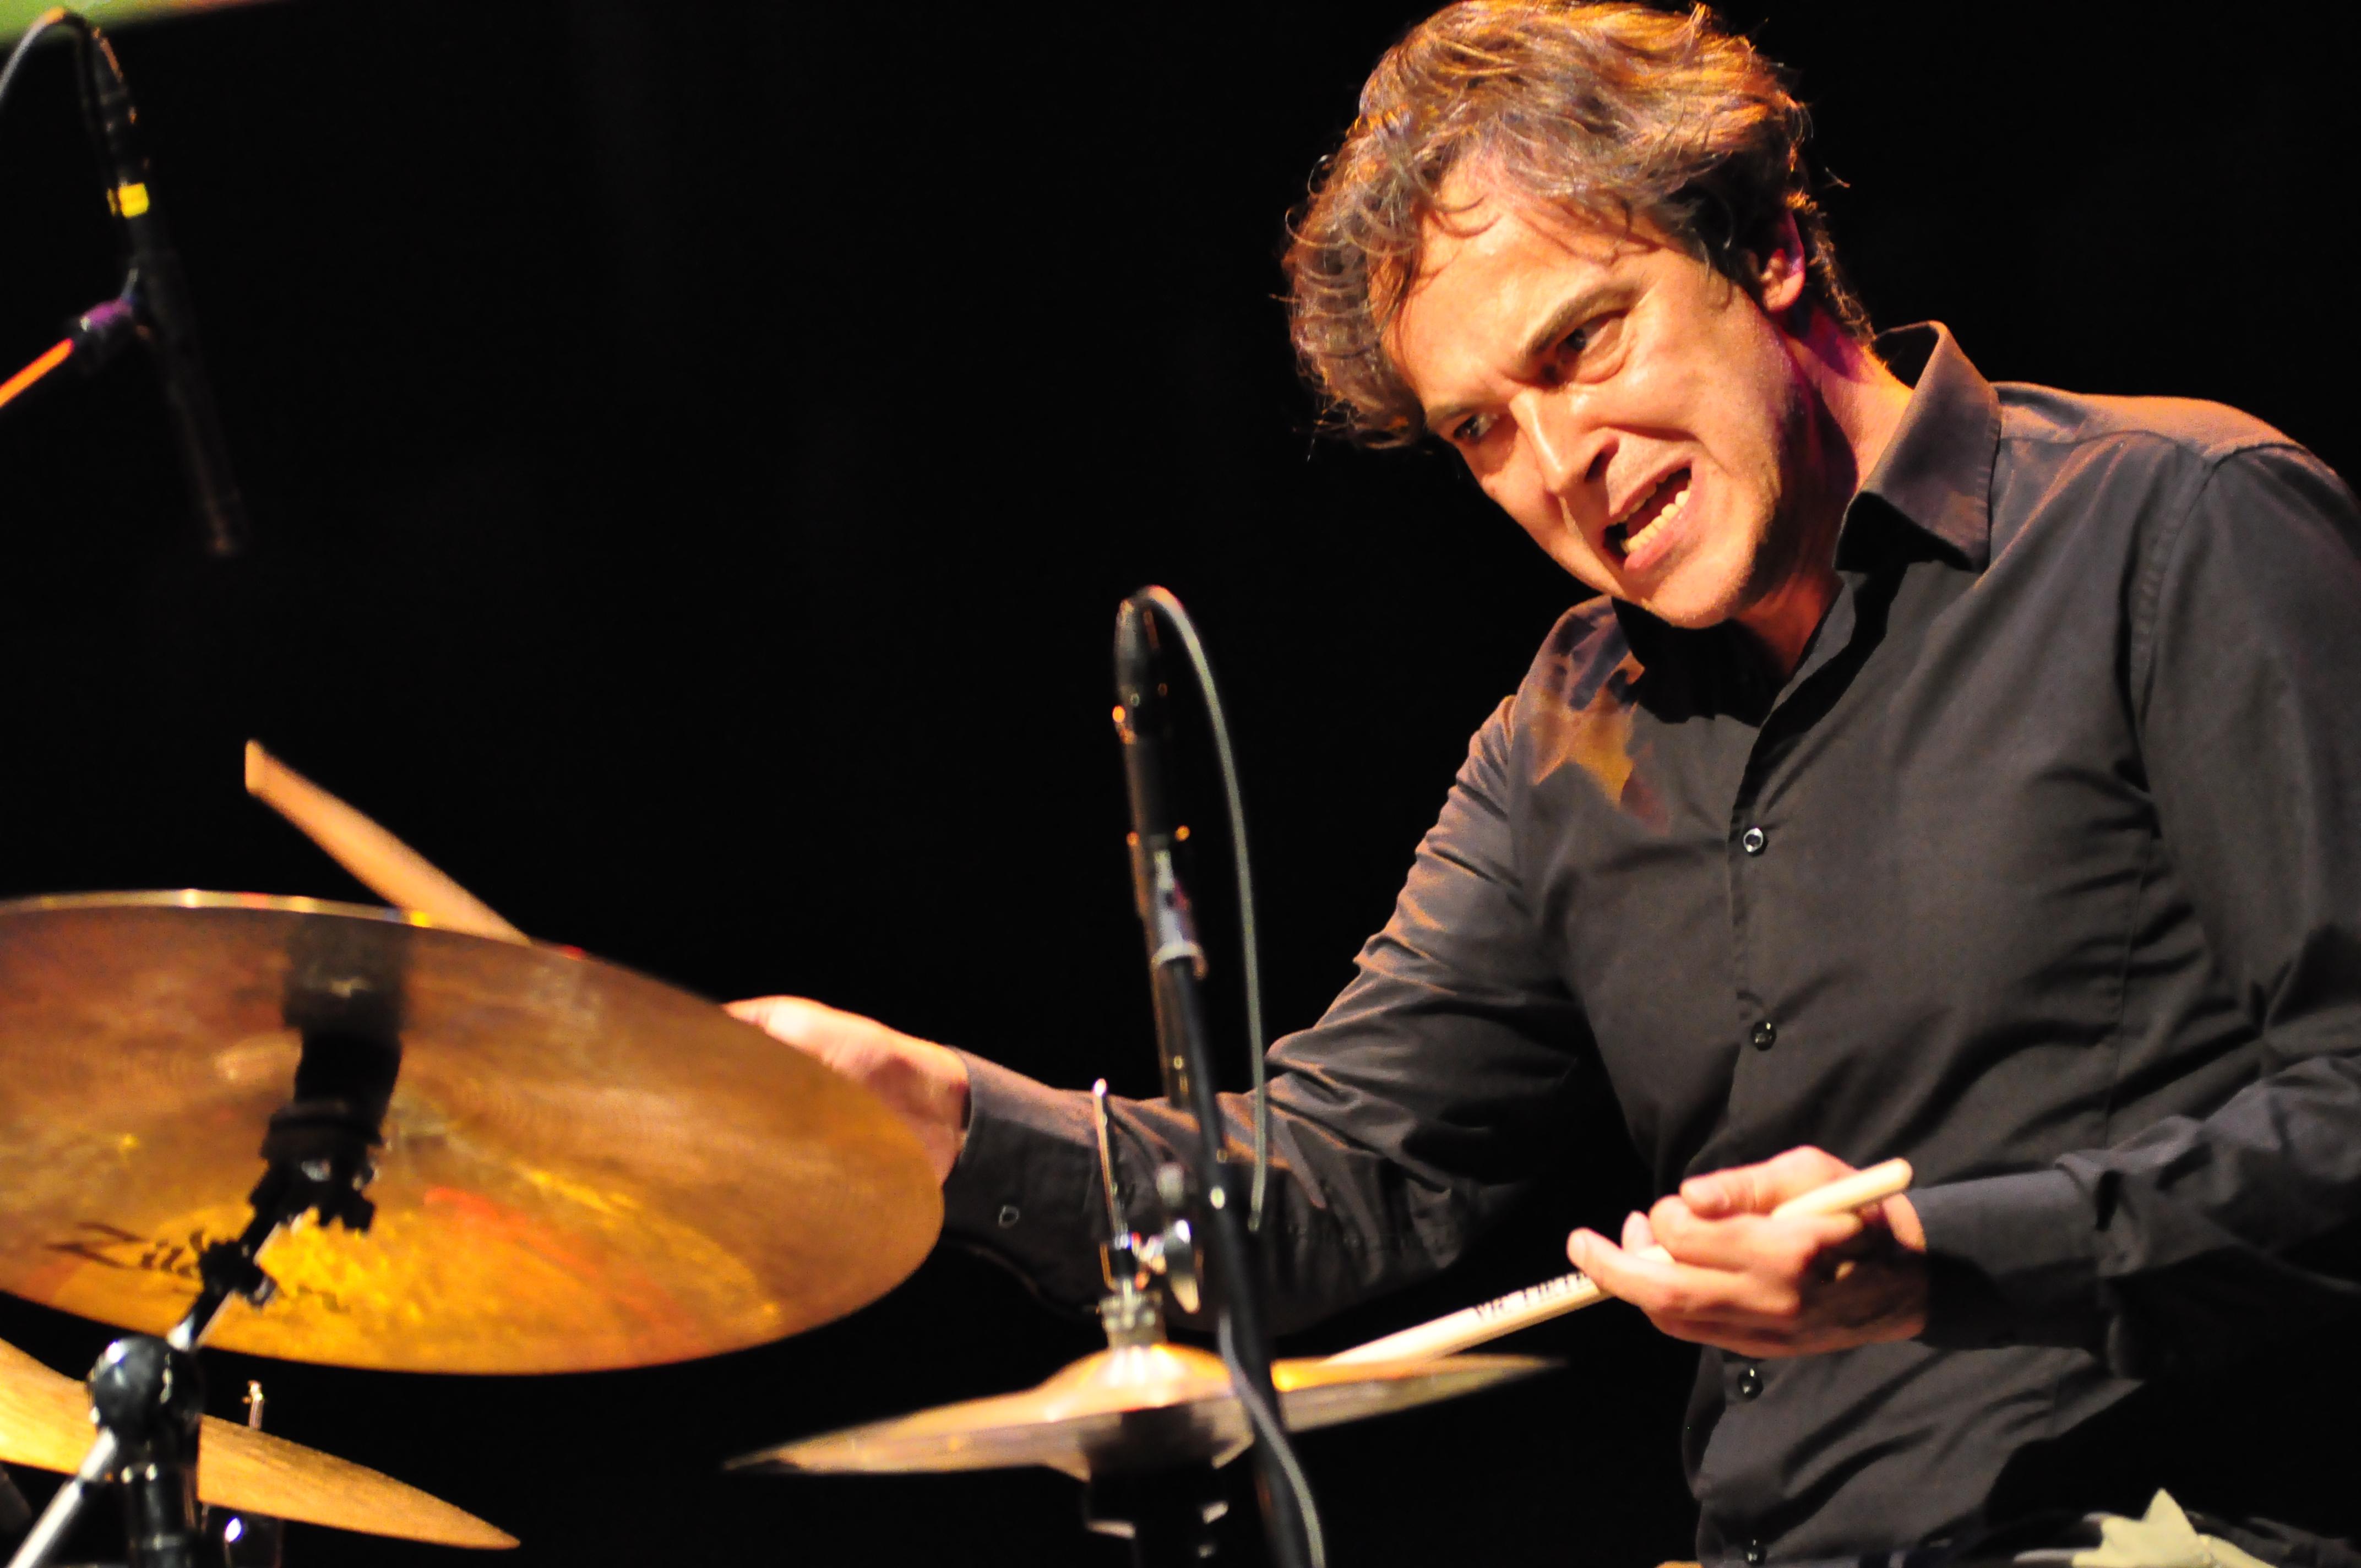 Esad Halilovic of Dusha Connection at Hong Kong International Jazz Festival. By Stephen Cheung